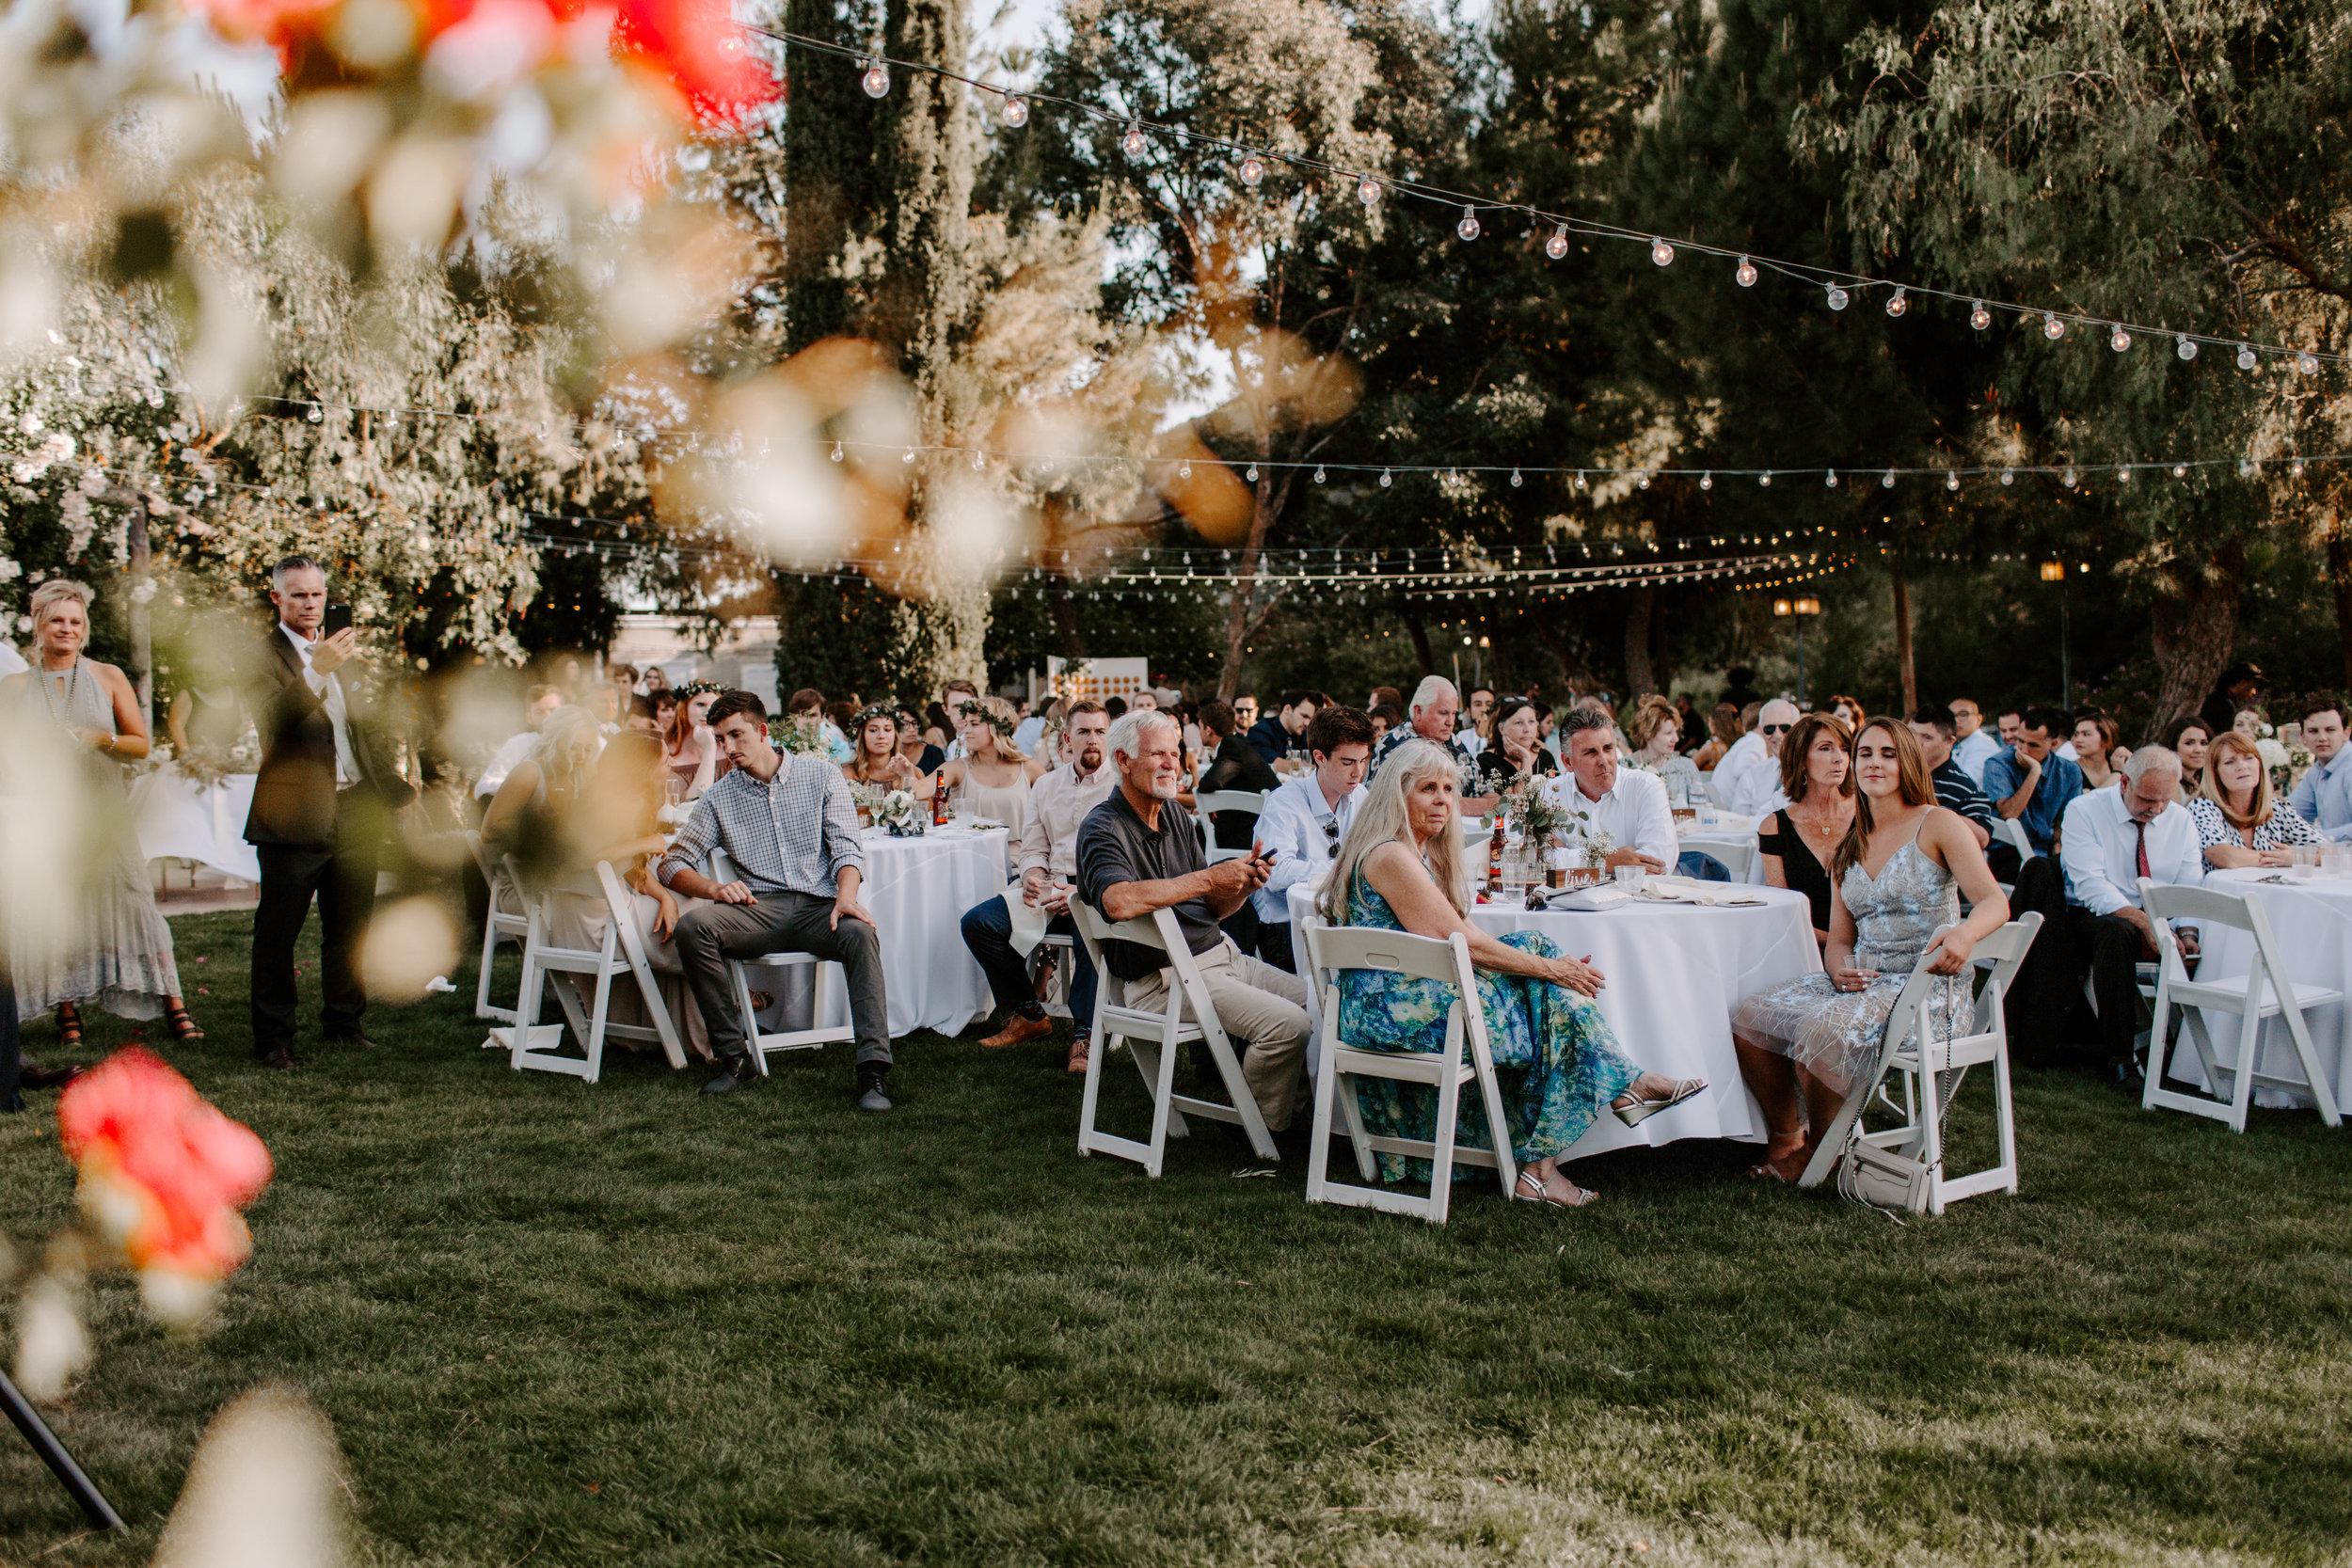 kate+zack_wedding_secludedgardenestate_temecula_madisonrylee_1029.jpg